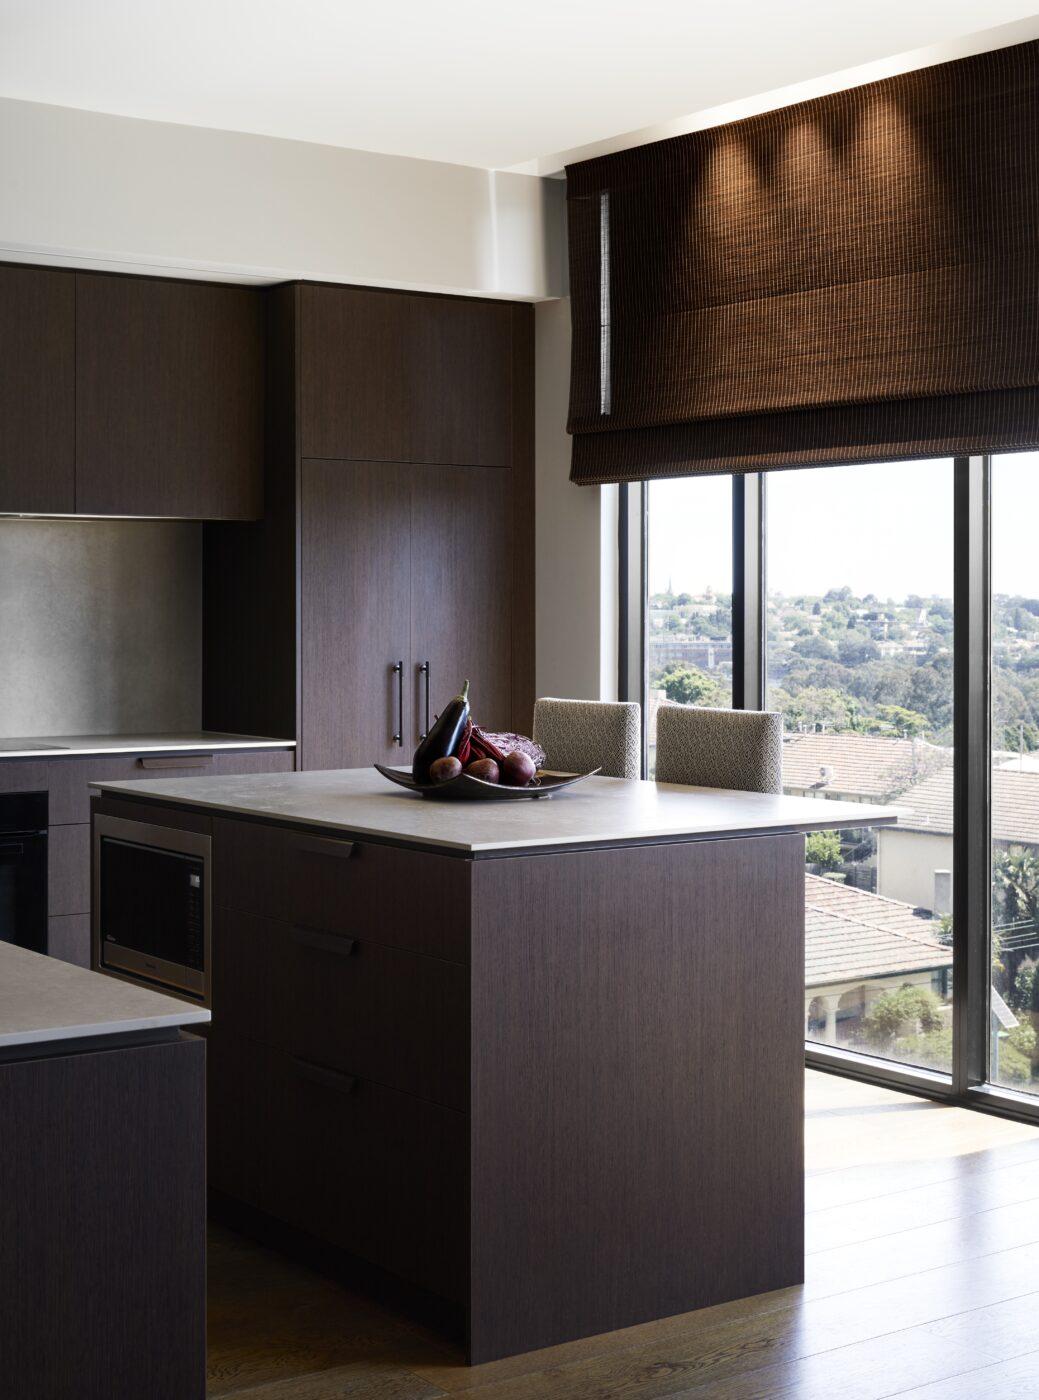 Camilla-Molders-Design-Interior-Design-Decoration-Melbourne-Hawthorn-Apartment-Interior-Design-Kitchen